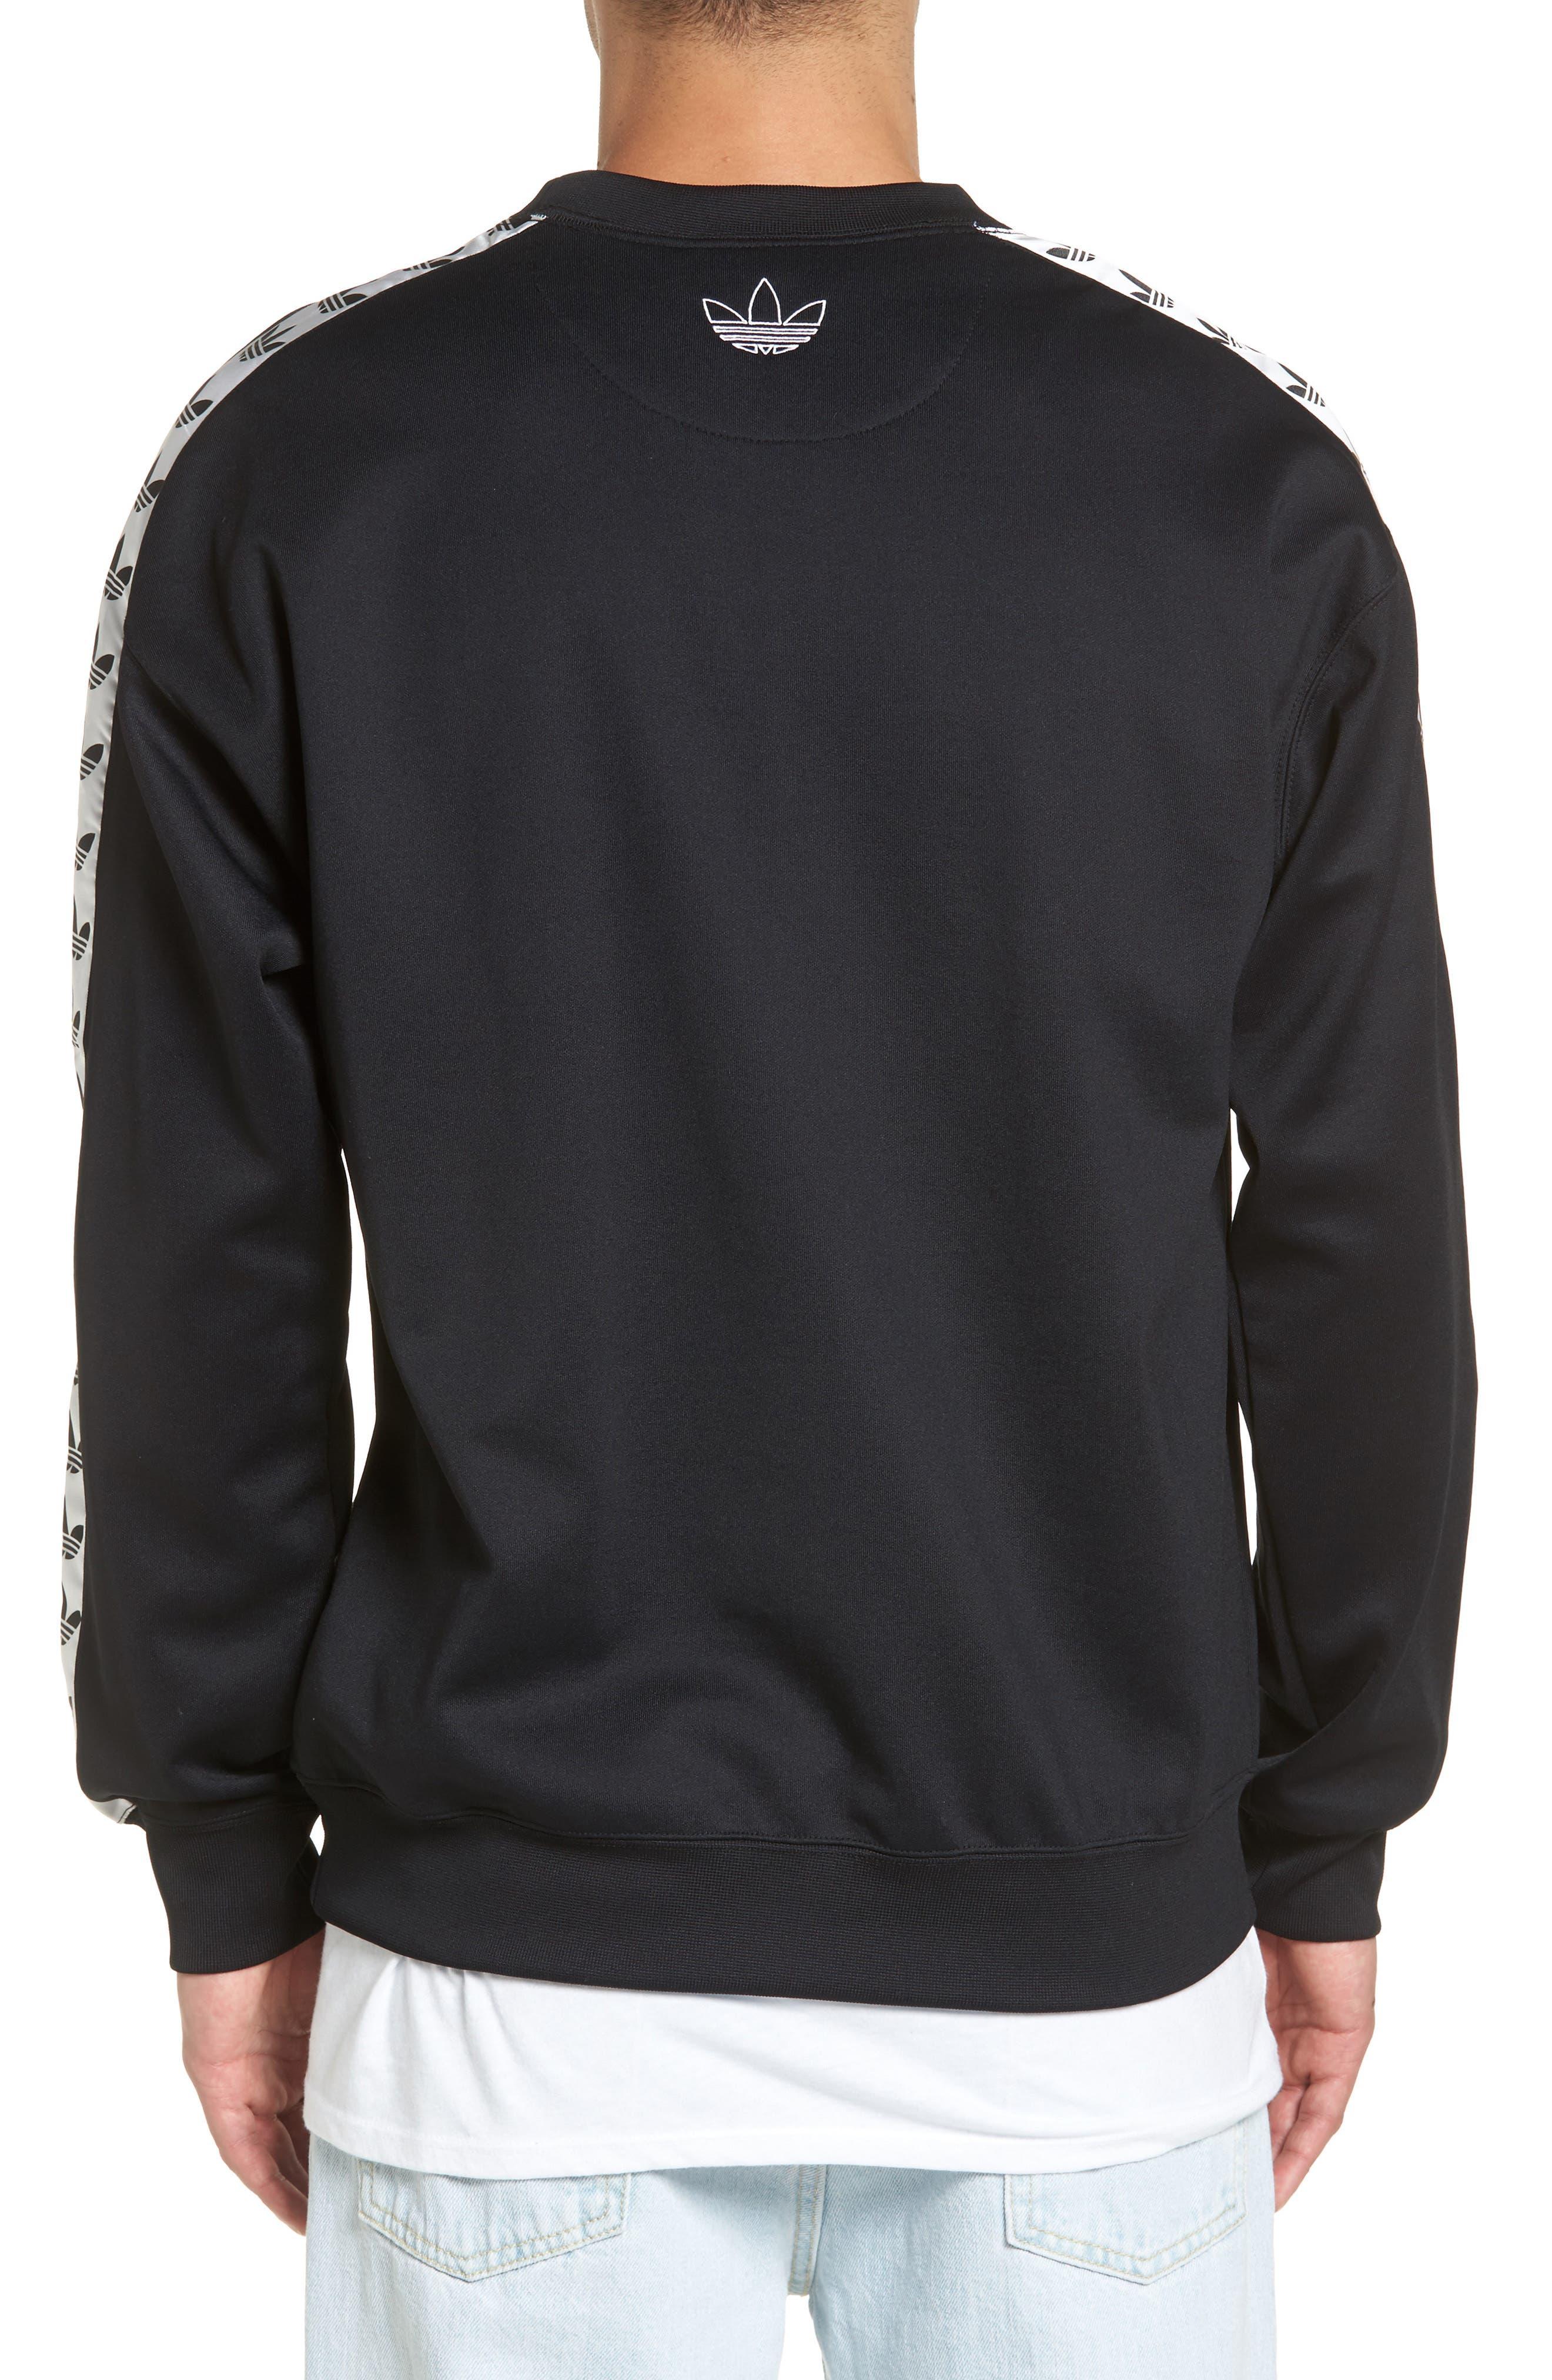 Alternate Image 2  - adidas Originals TNT Trefoil Sweatshirt